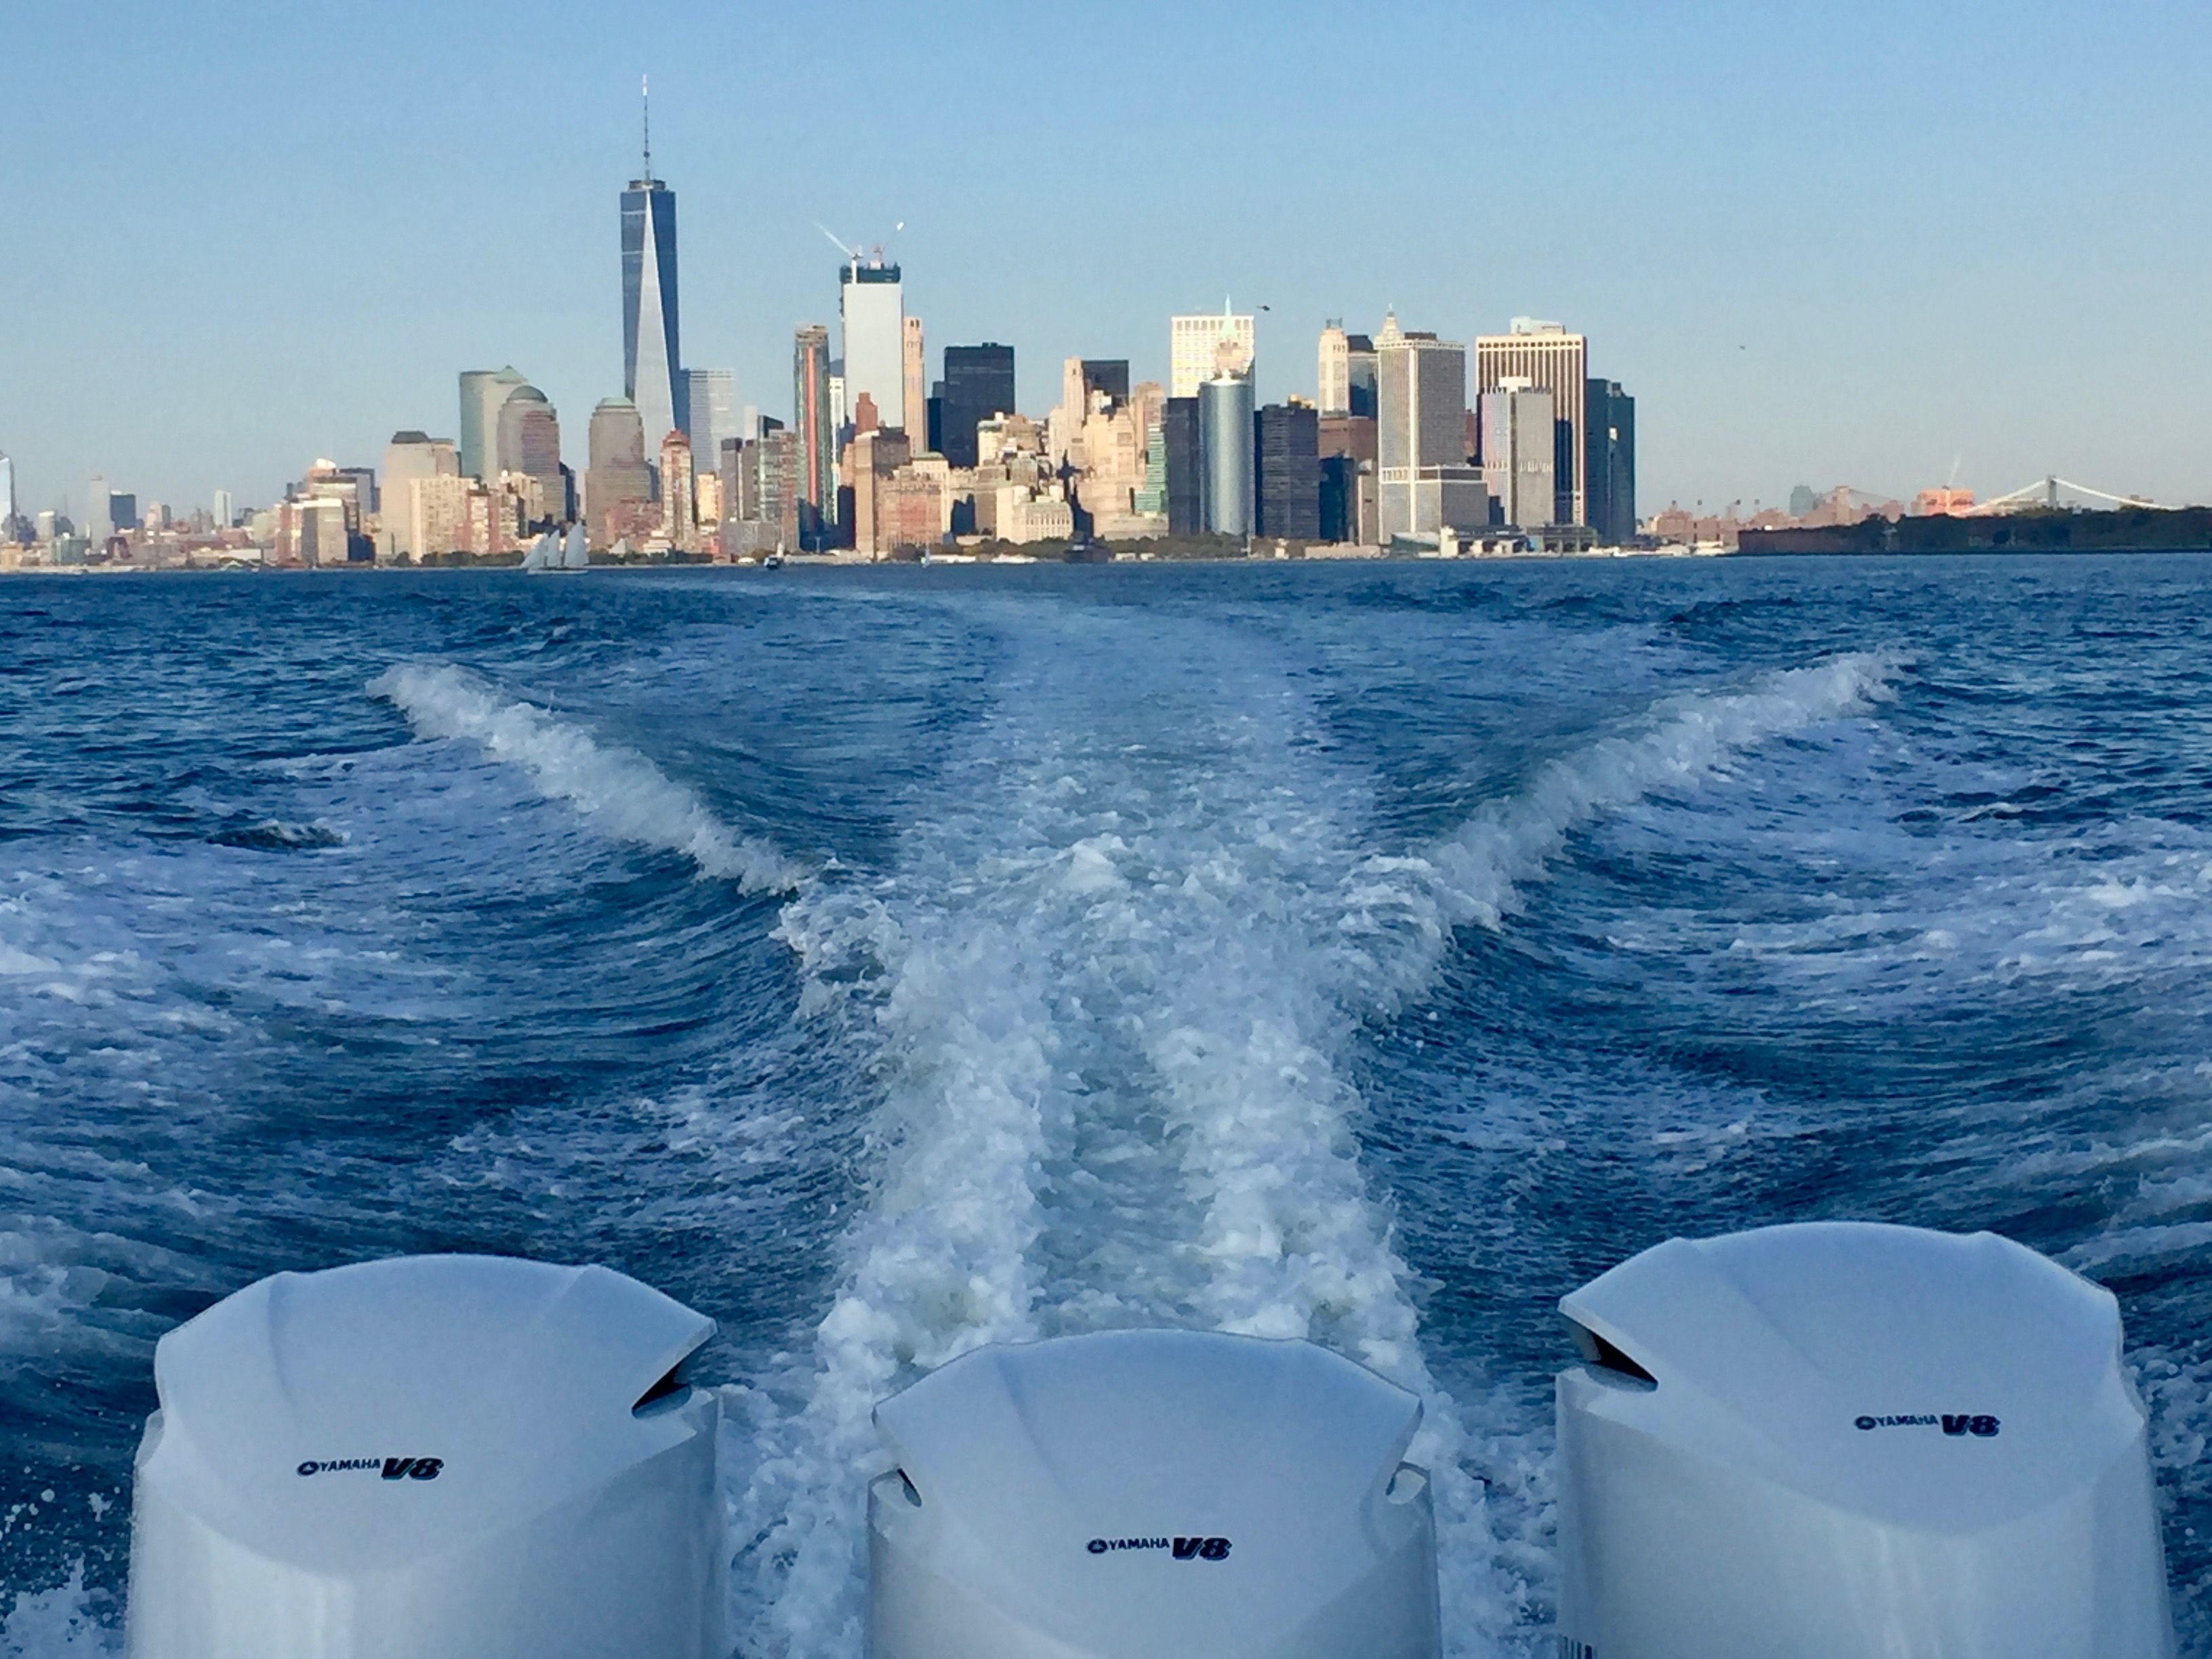 Dockwa Makes Wake: Cruising Down the Coast from Newport to Atlantic City